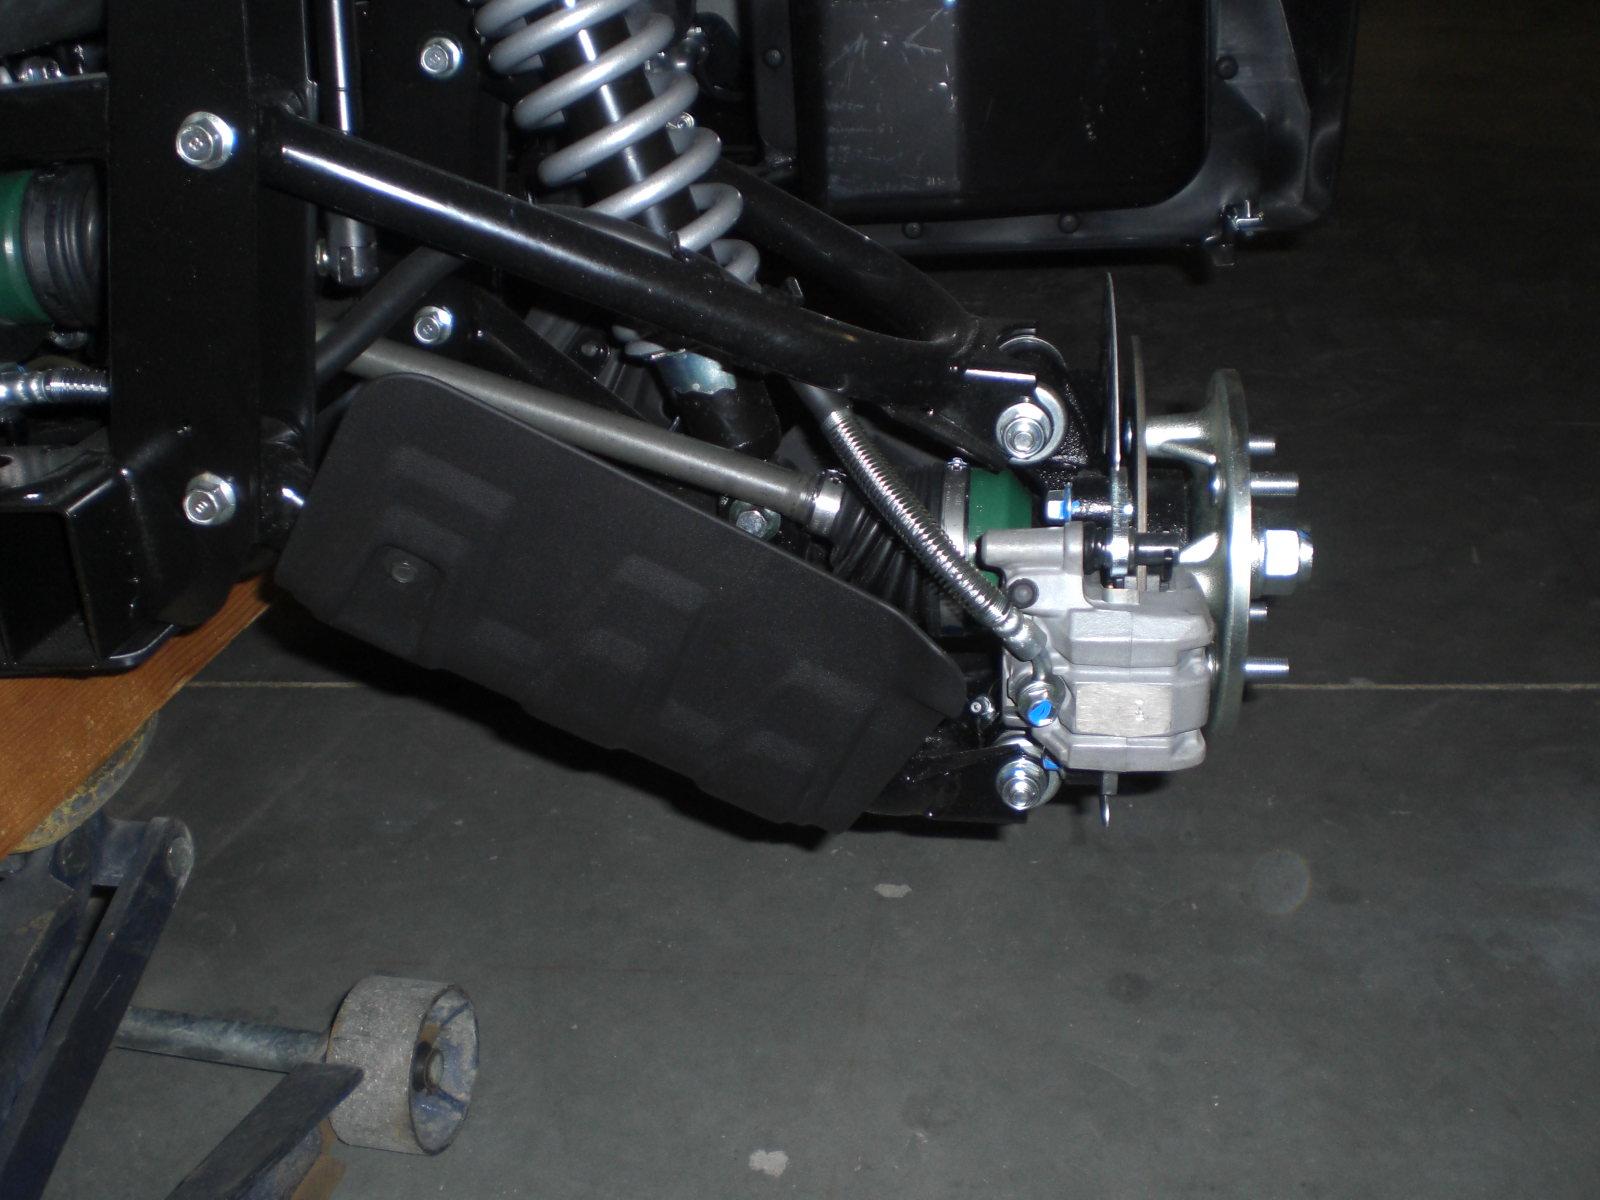 hight resolution of  2008 yamaha rhino rear disk brakes